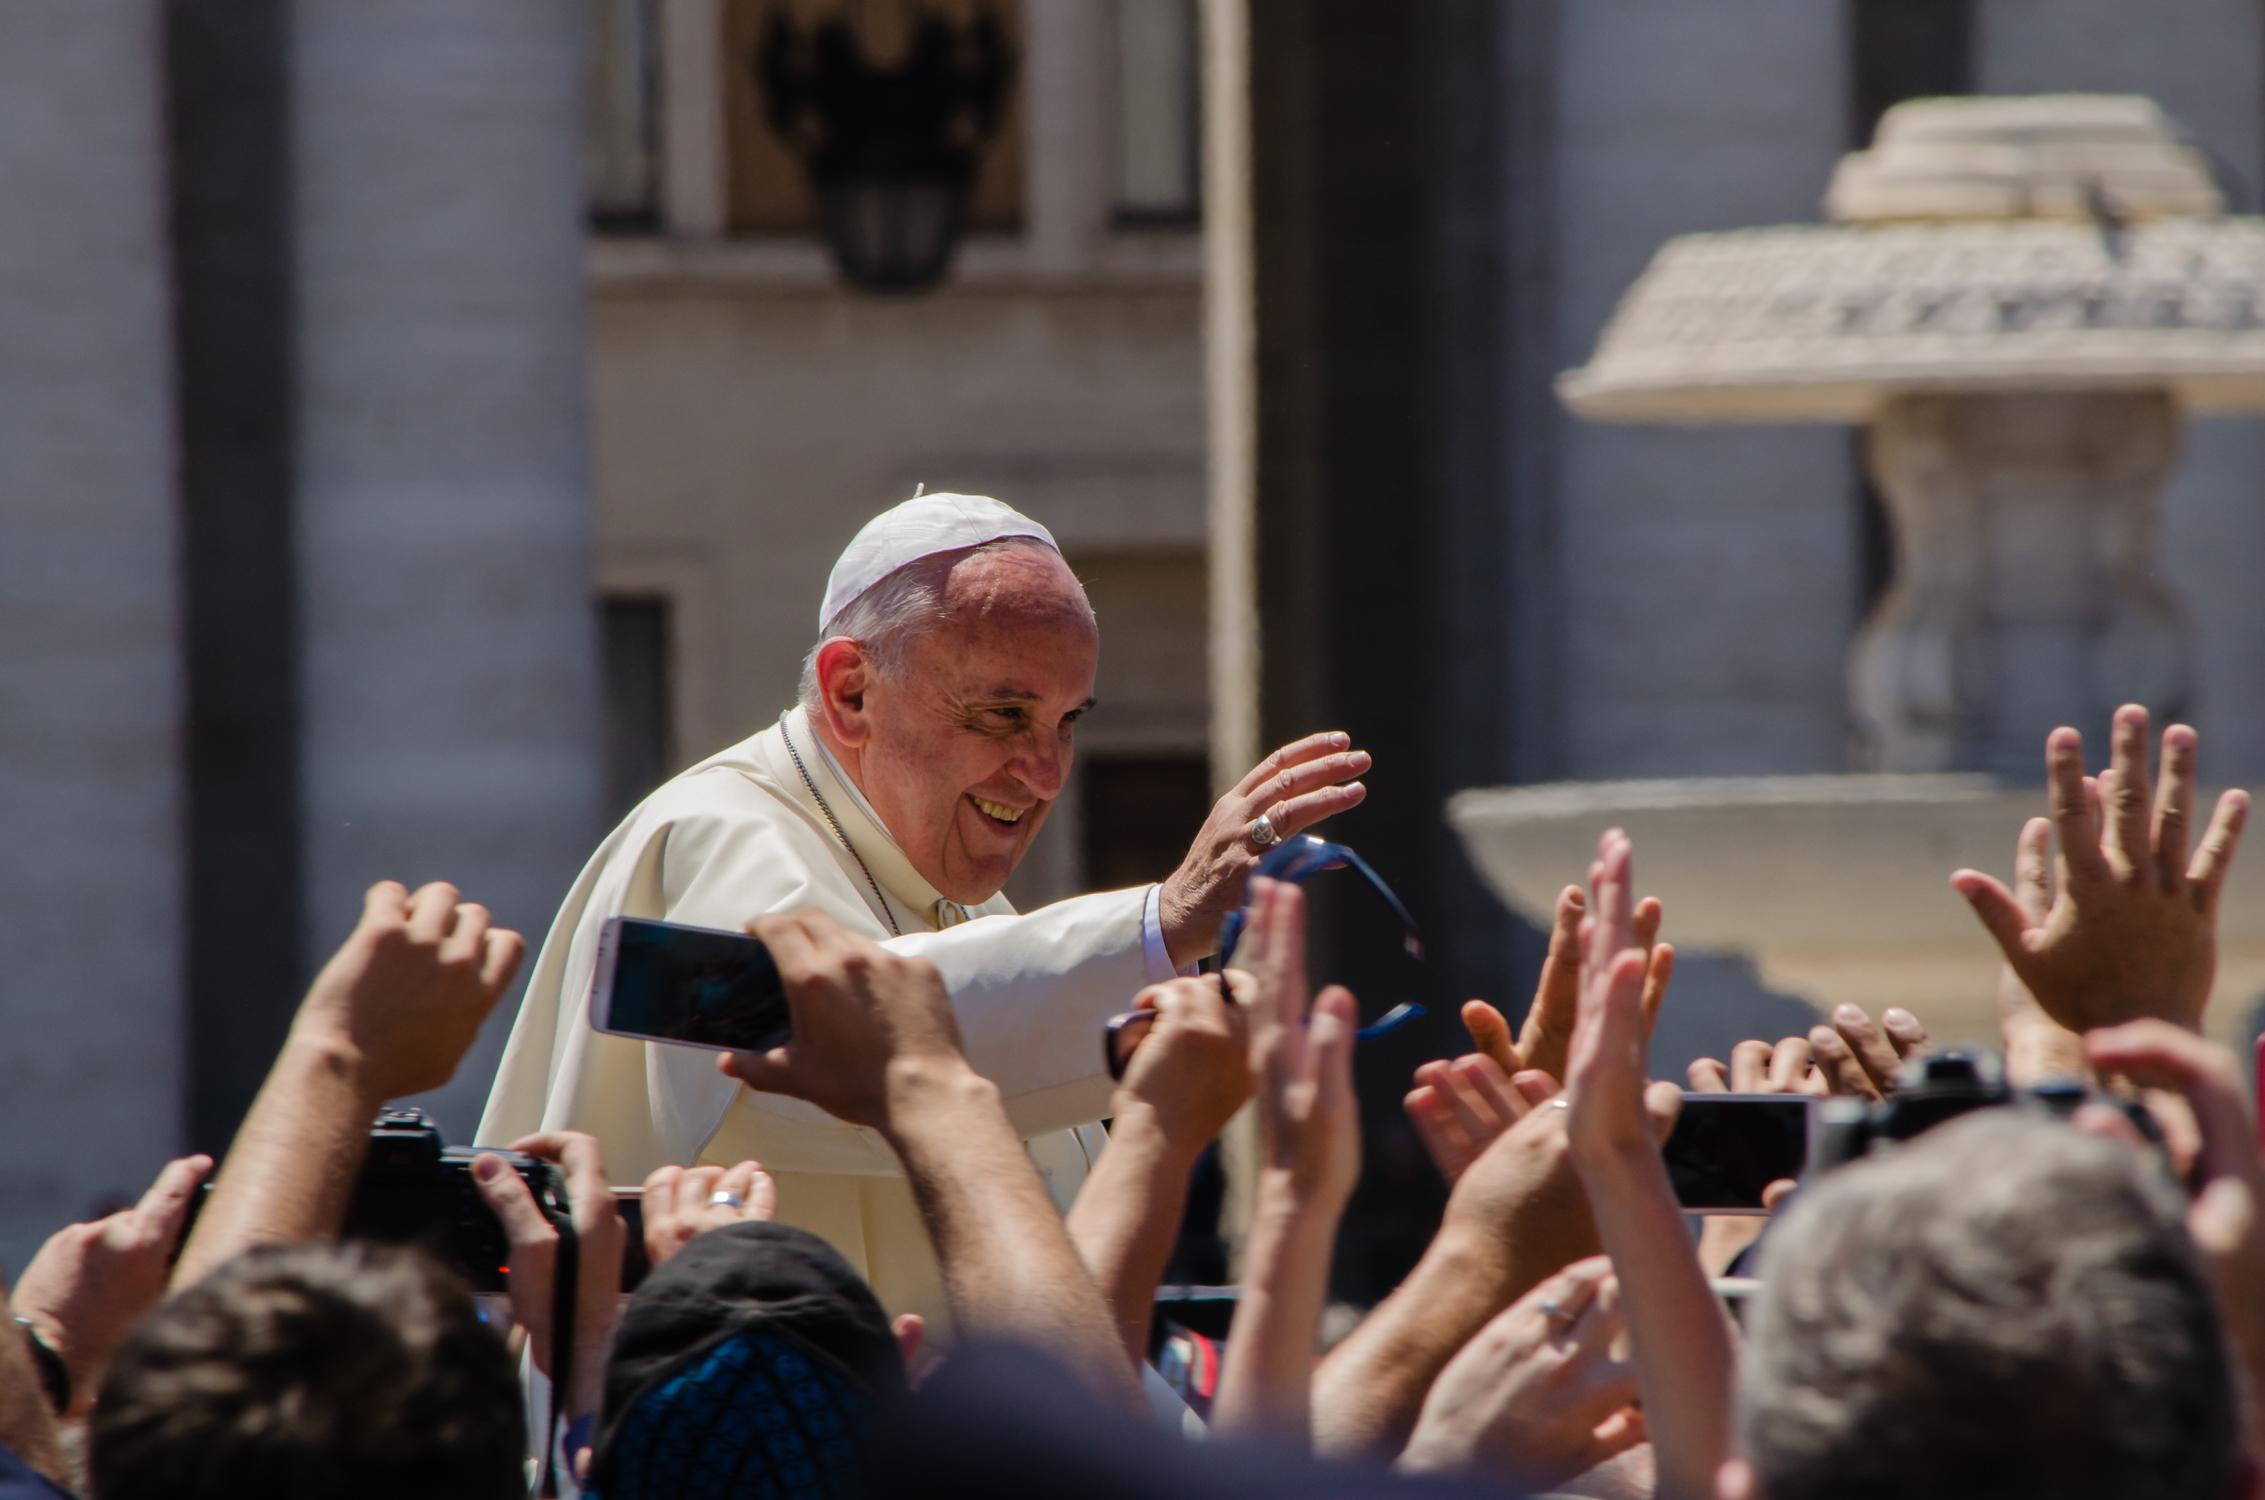 Il Sommo Pontefice, Sua Santità Papa Francesco